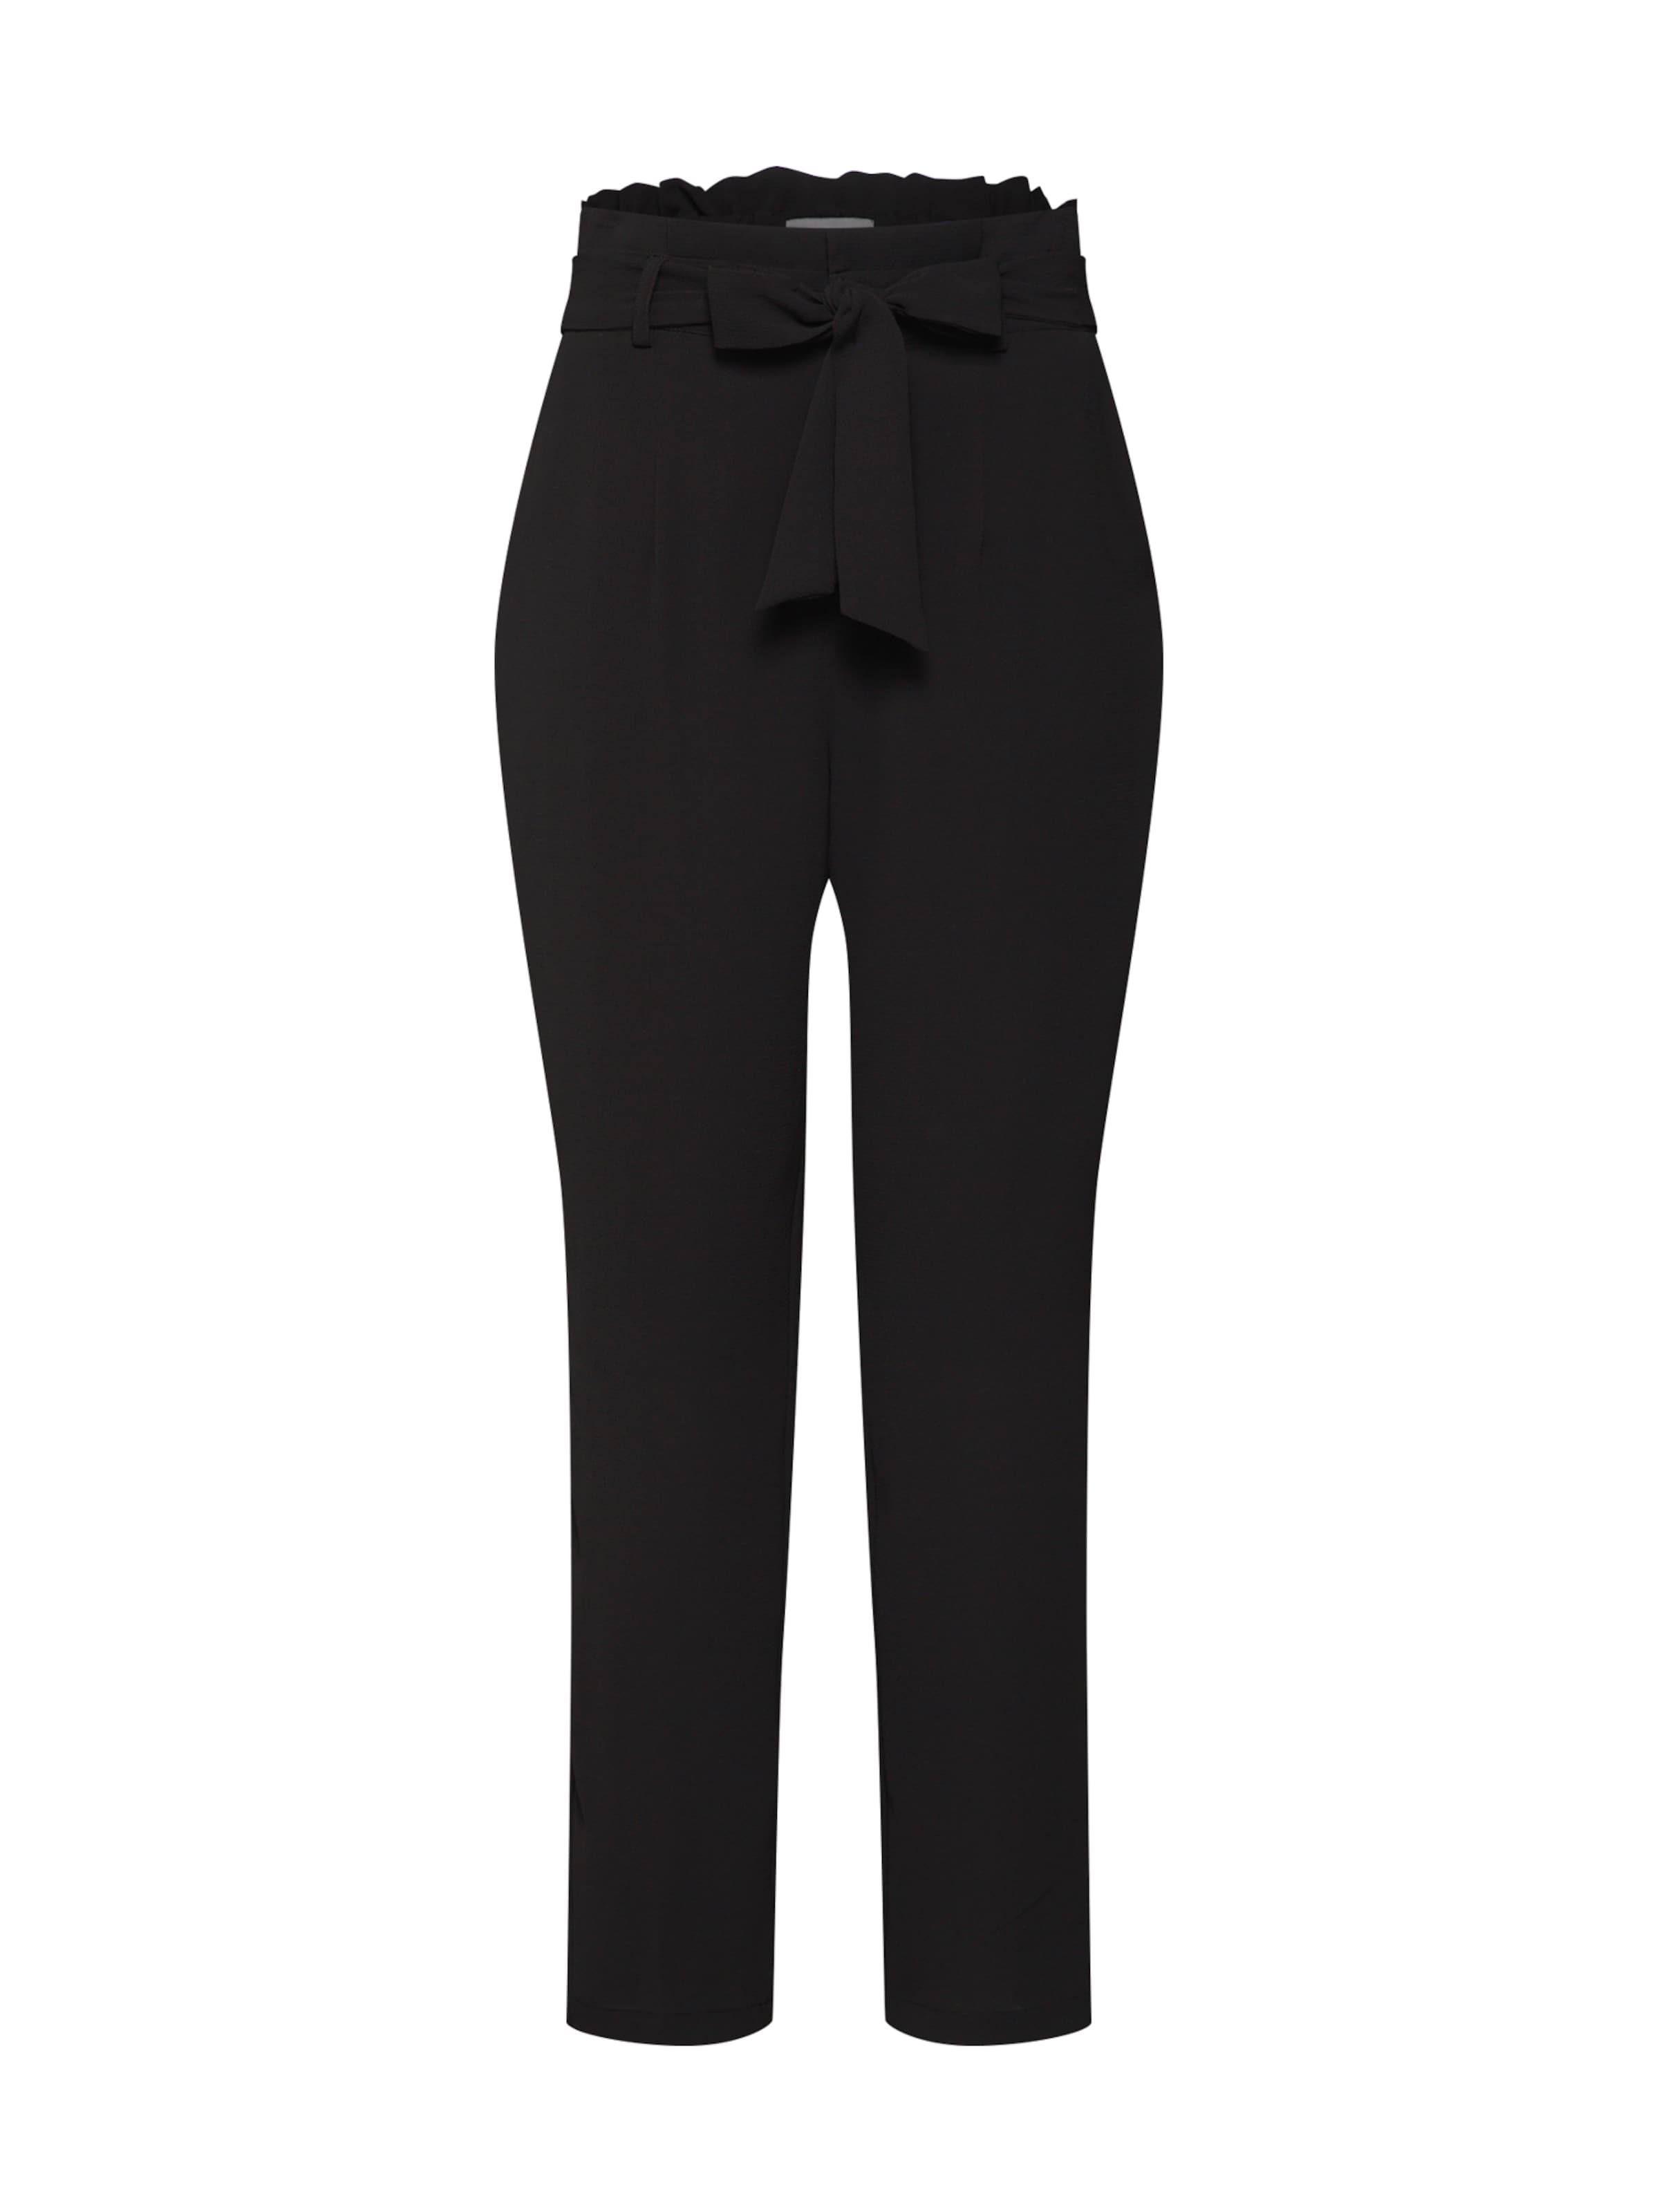 Noir Pantalon 'eleana' En 'eleana' Culture En Pantalon Culture EDHW2Y9I